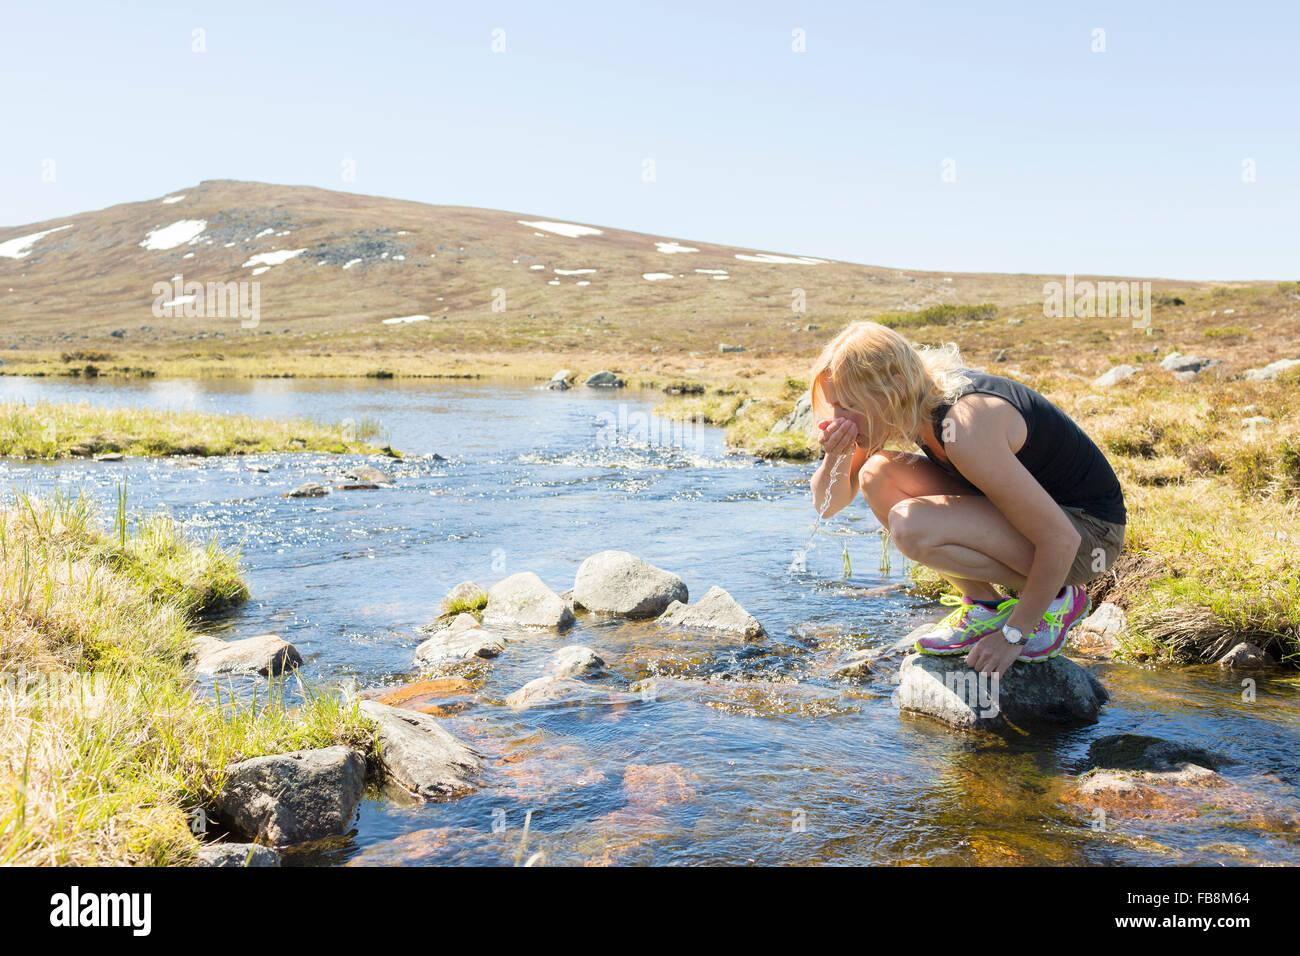 Sweden, Dalarna, Grovelsjon, Woman drinking water from mountain river - Stock Image